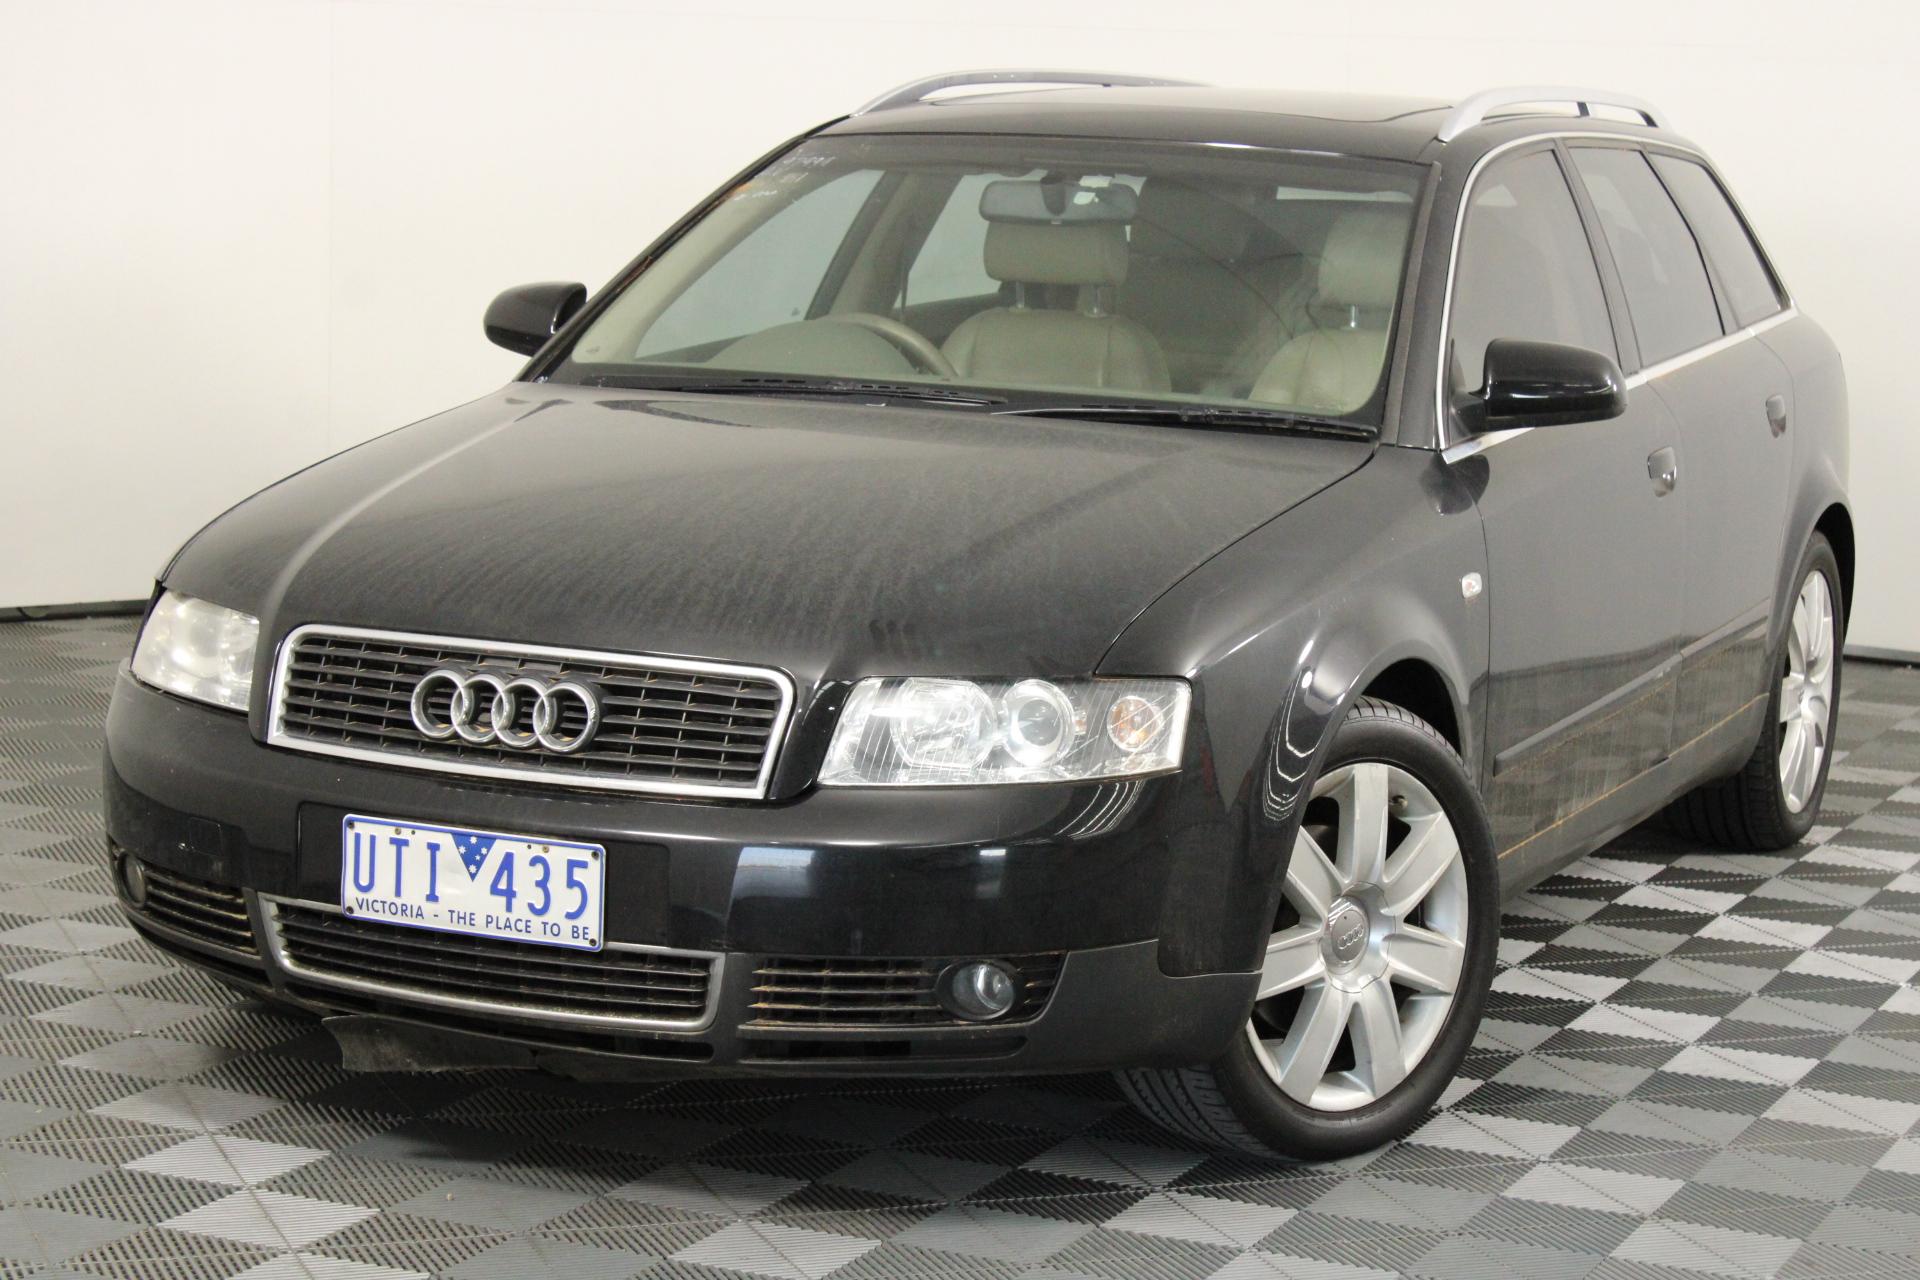 2003 Audi A4 2.0 B6 CVT Wagon